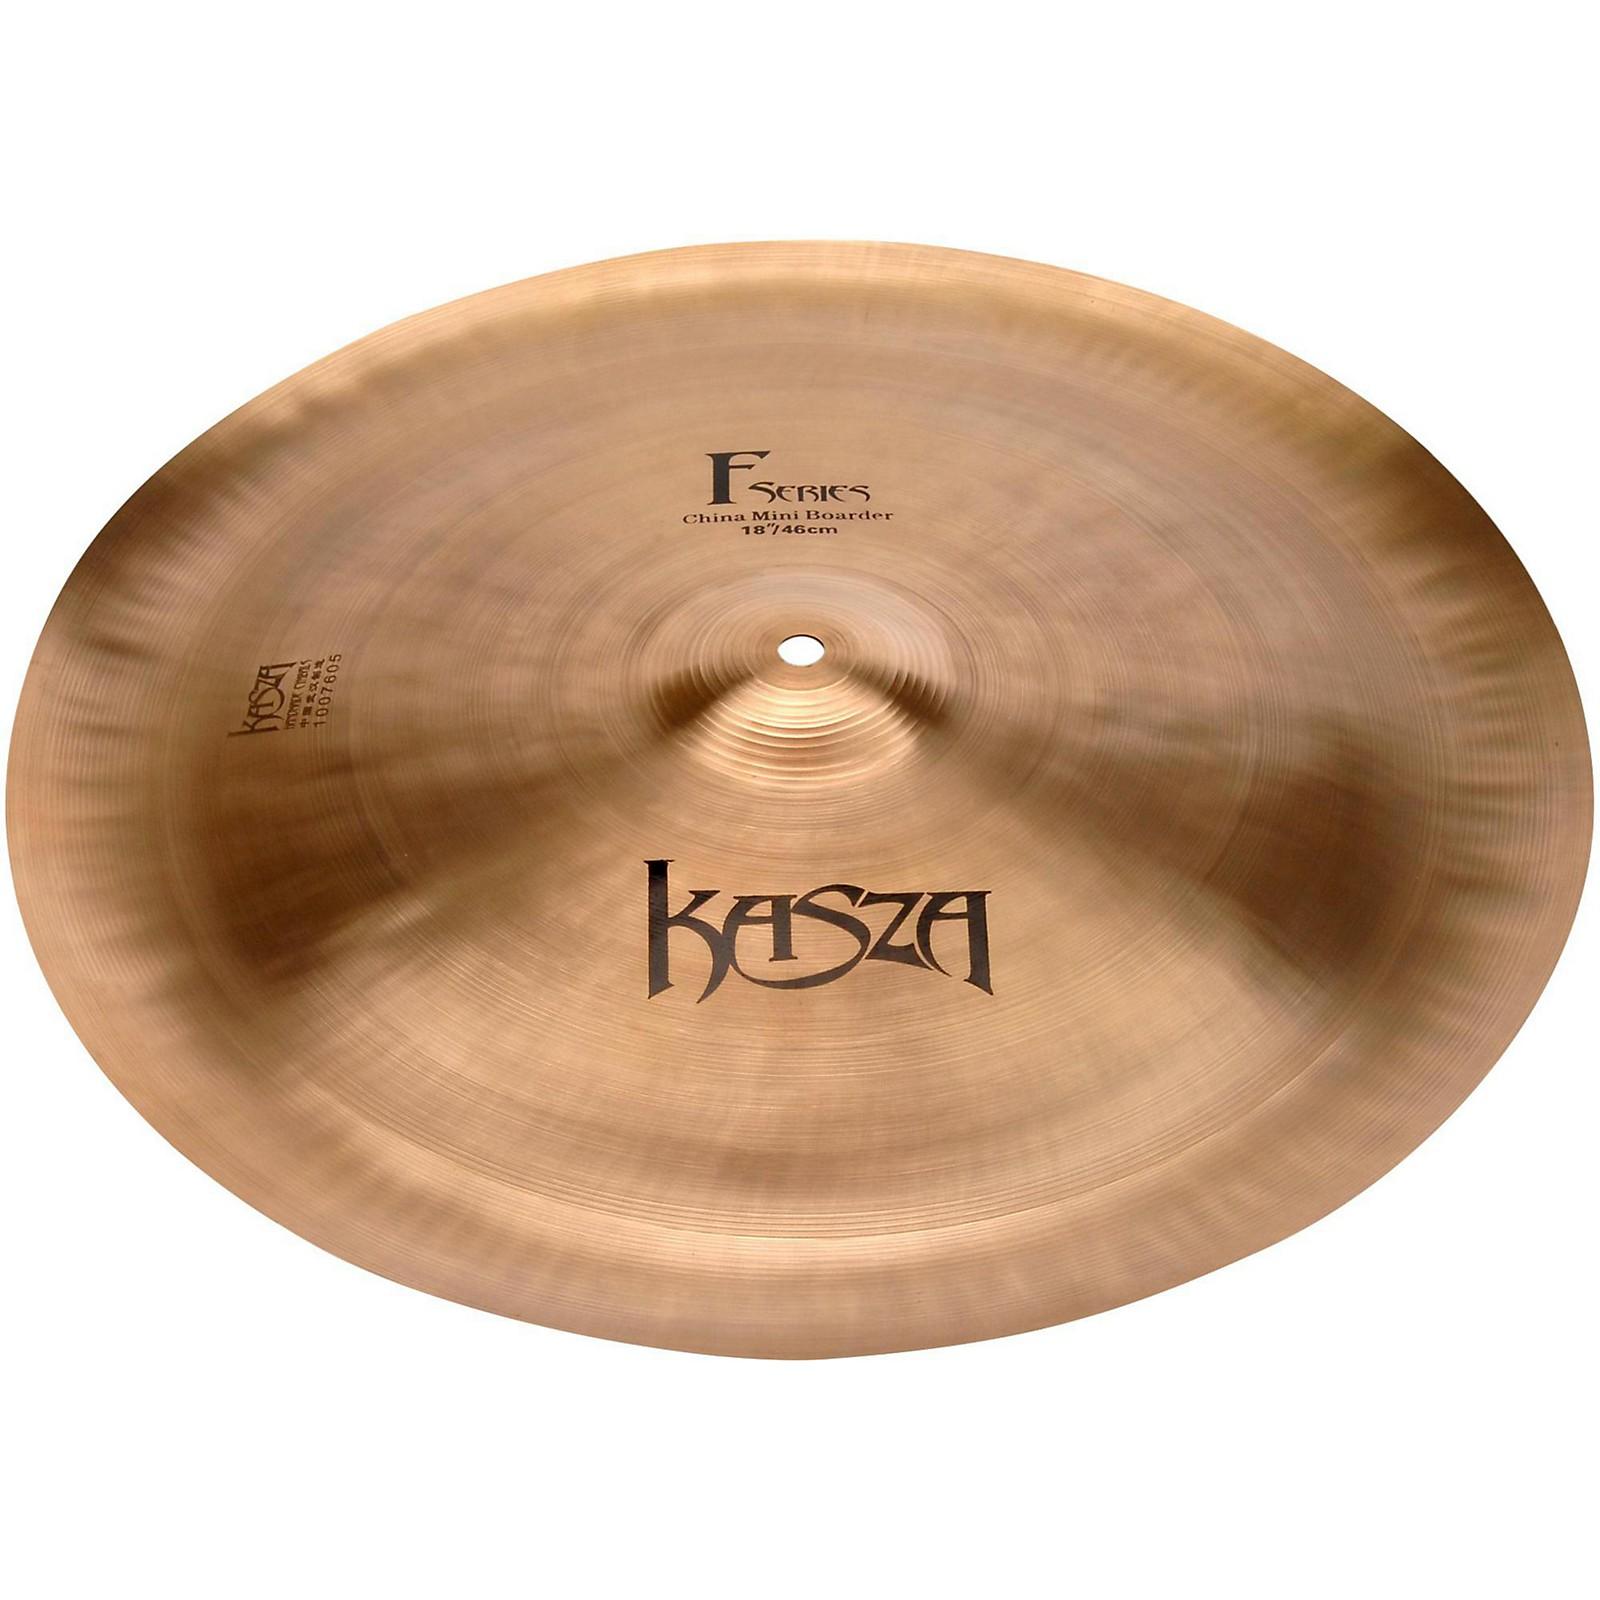 Kasza Cymbals Wester Mini Boarder Fusion China Cymbal